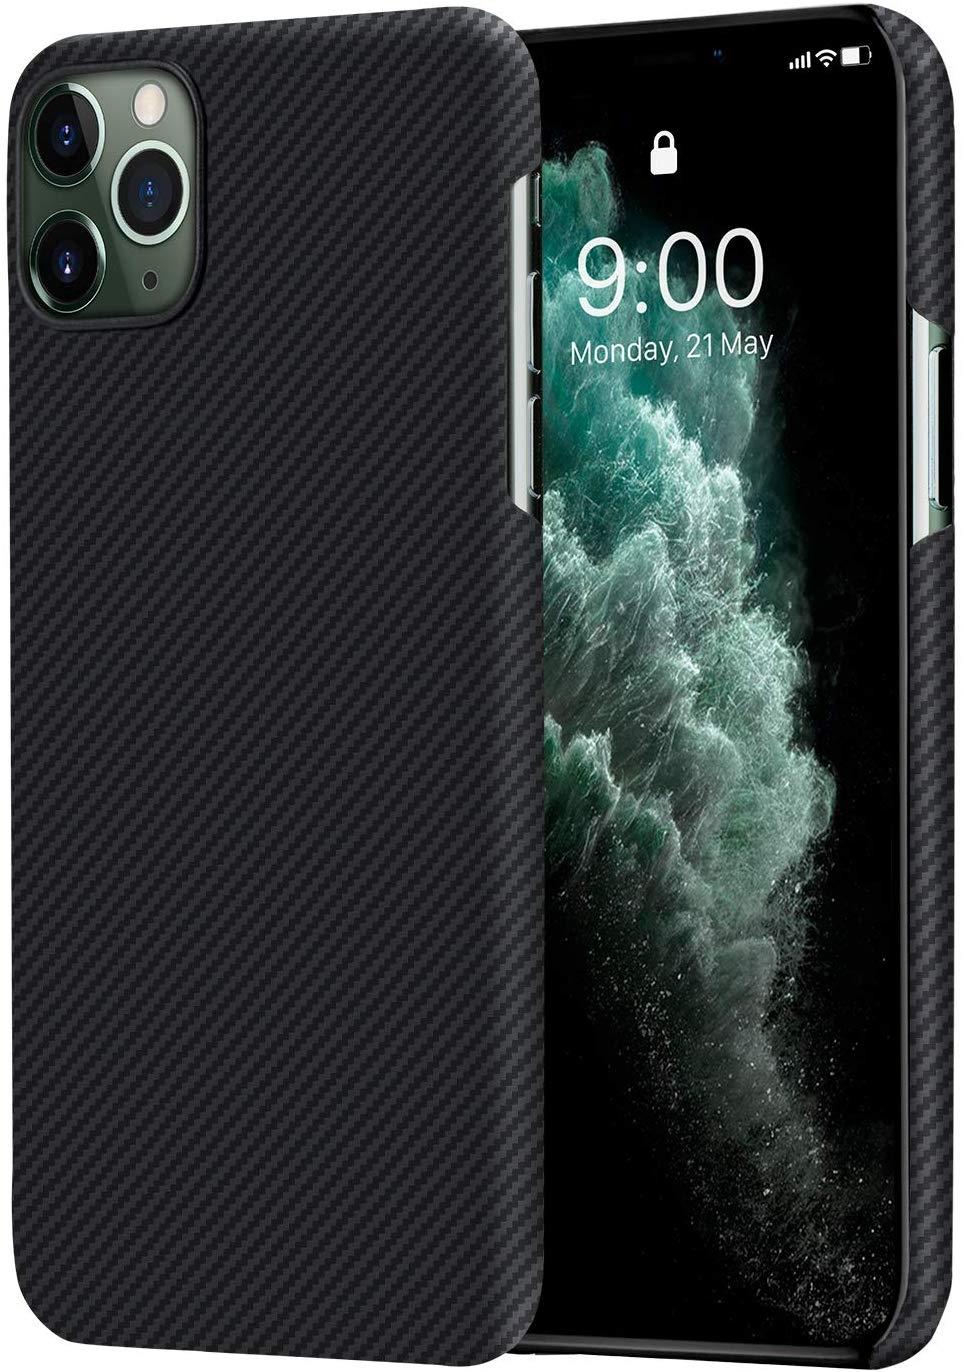 Pitaka Air Case - Θήκη Kevlar Body iPhone 11 Pro Max - 0.6mm - Black (KI1101MA)